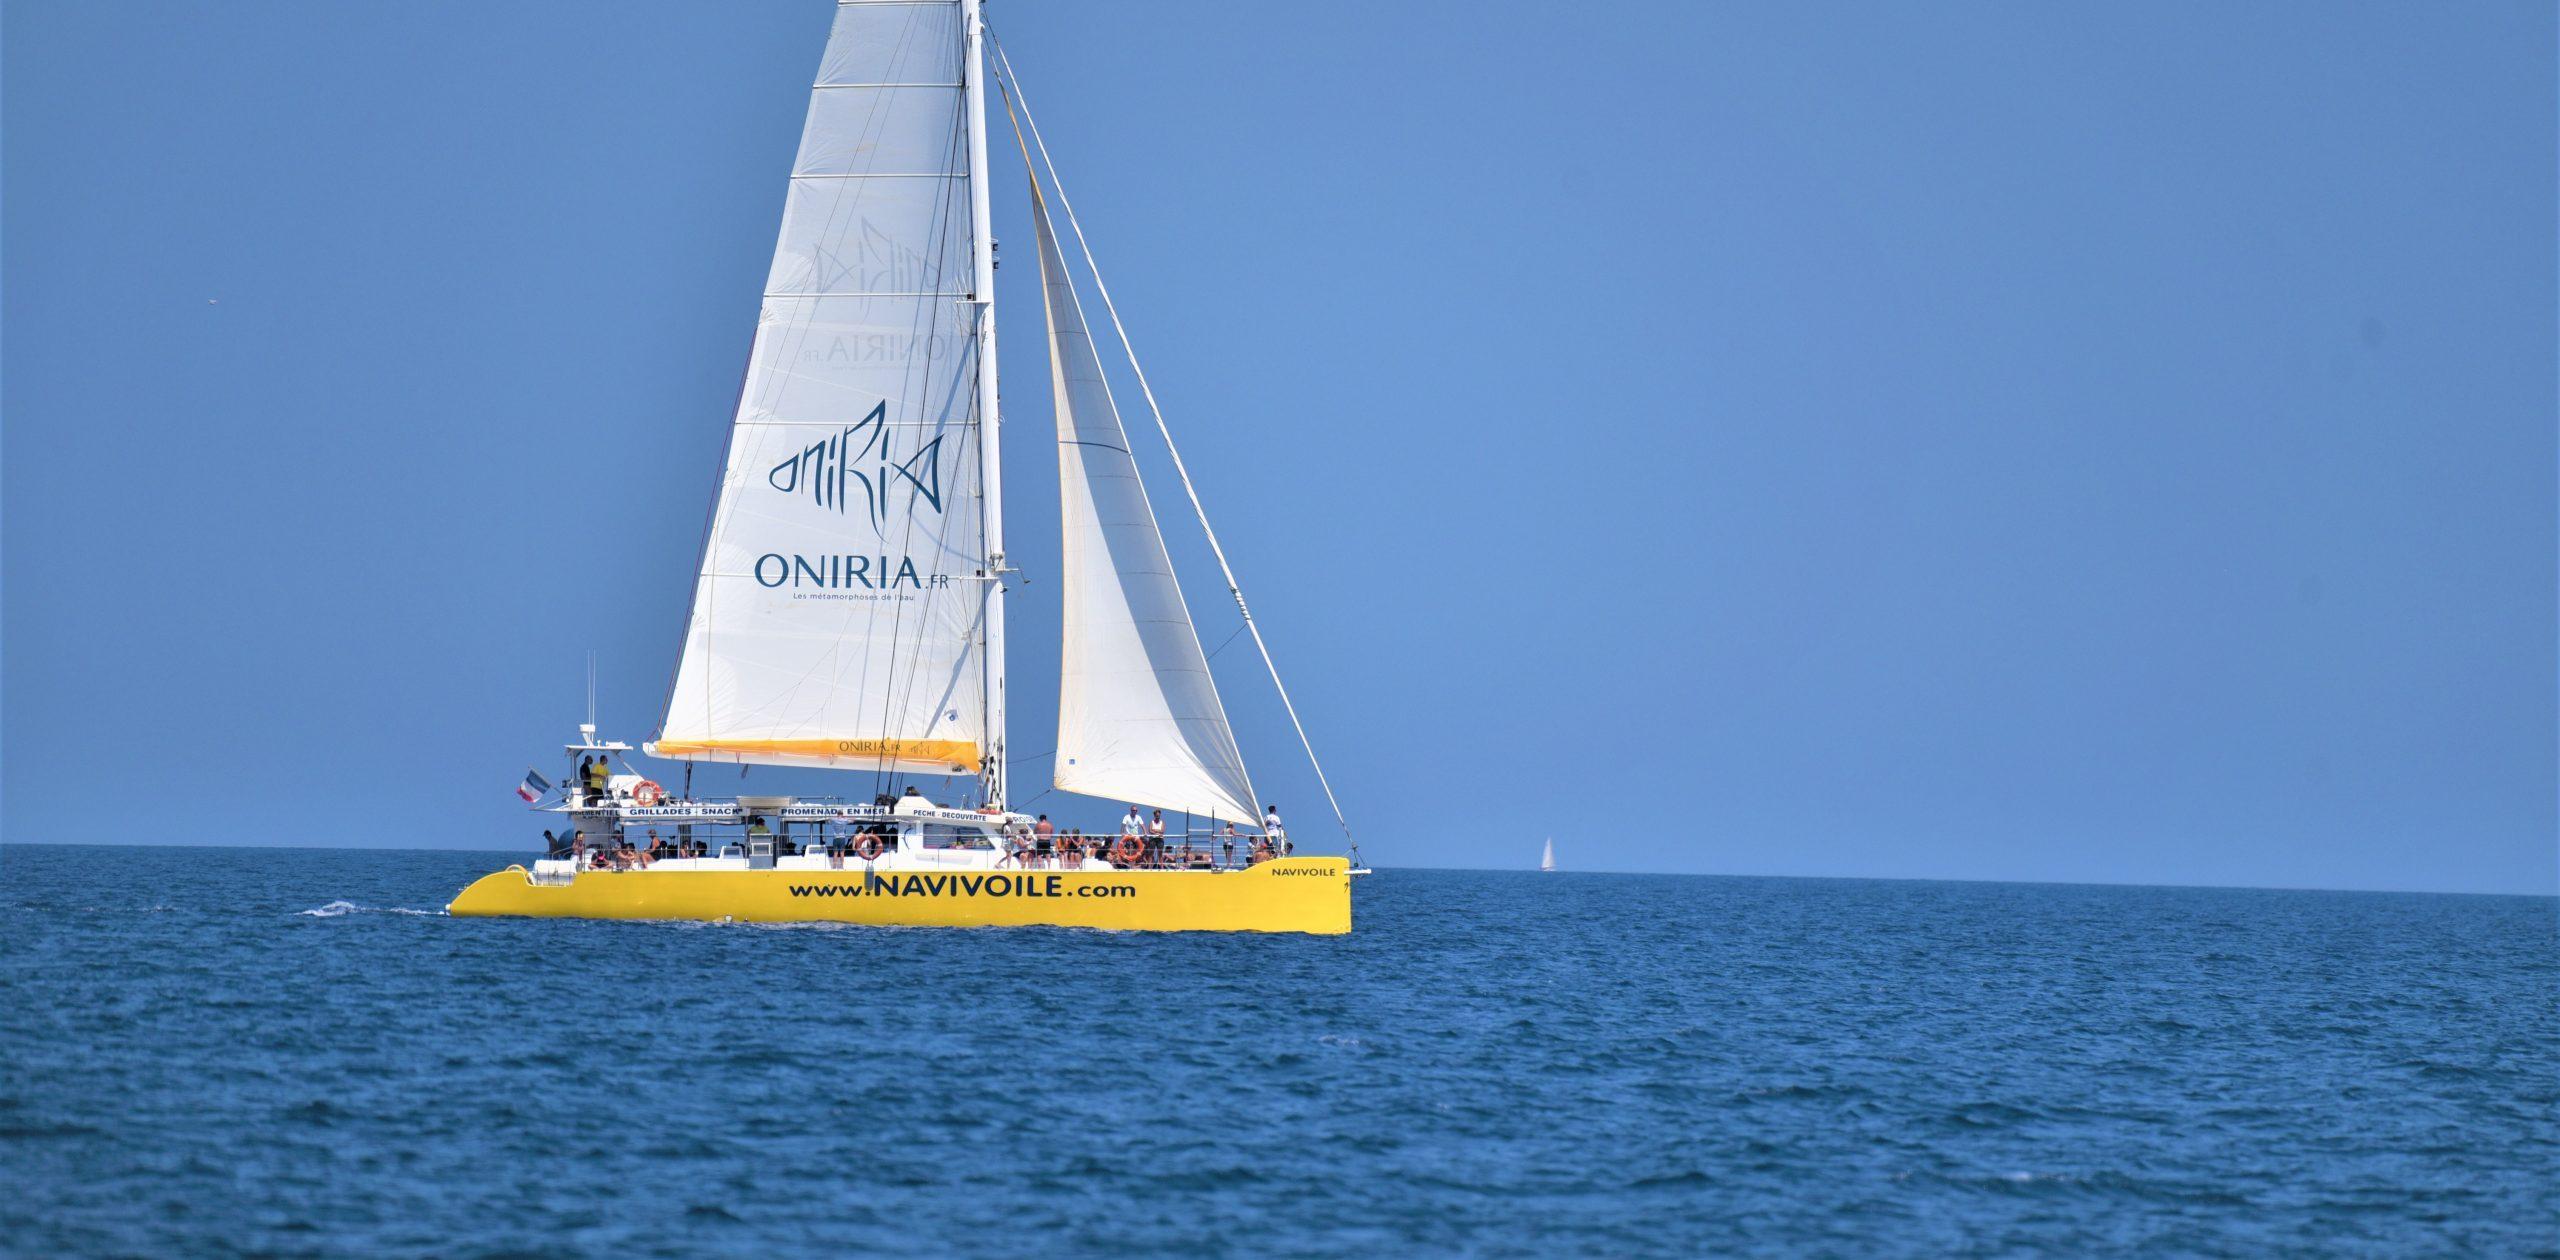 catamaran navivoile aquarium oniria canet en roussillon 66